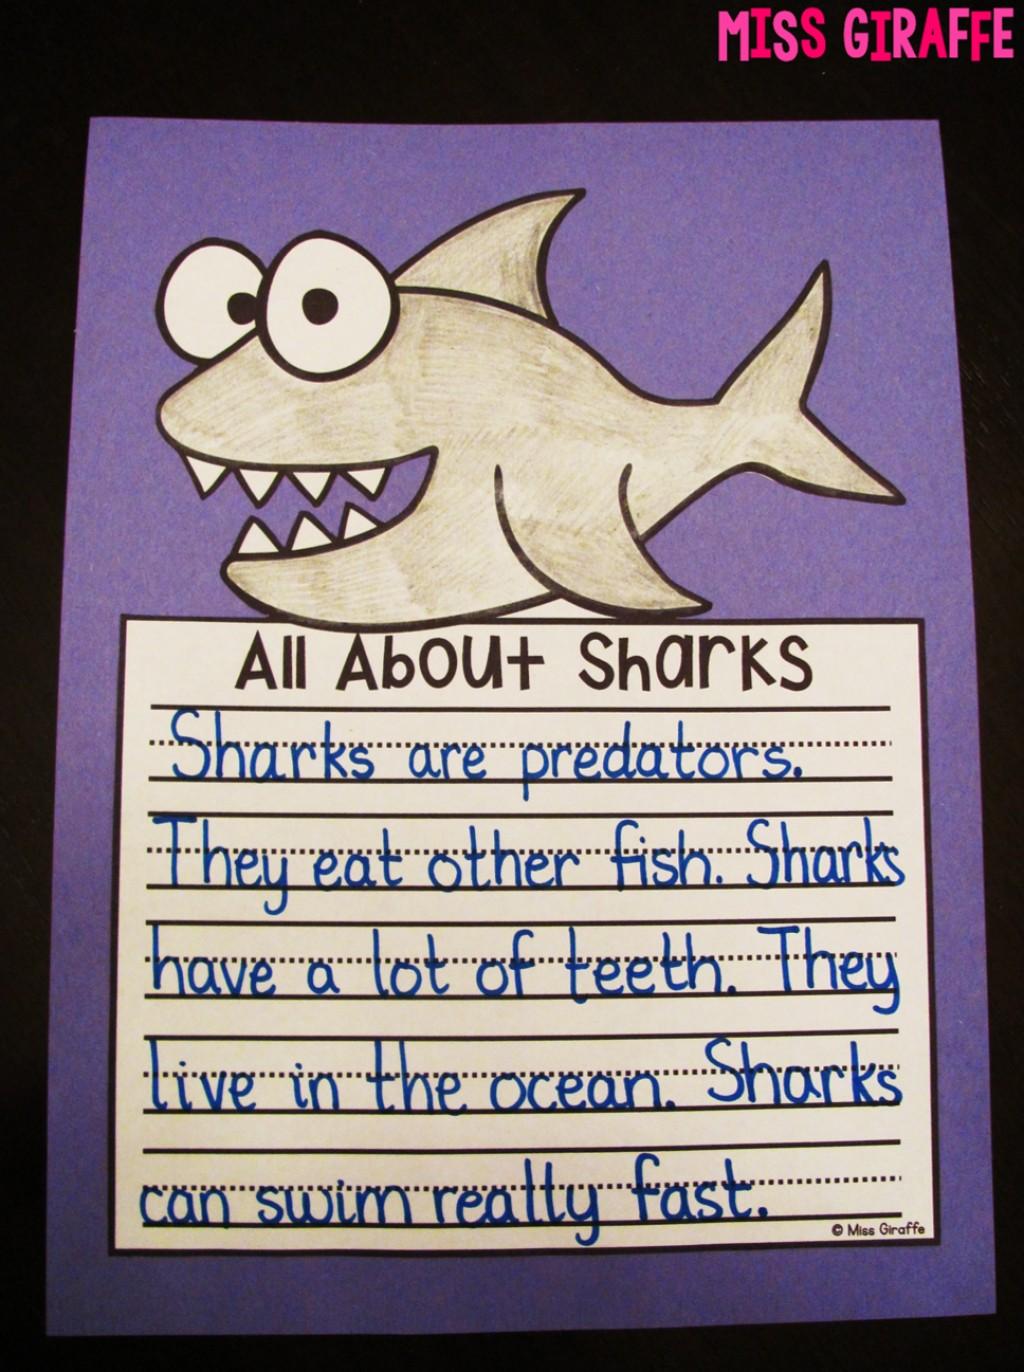 018 Essay Example Shark Wonderful Essayshark Sign Up Topics Questions Large